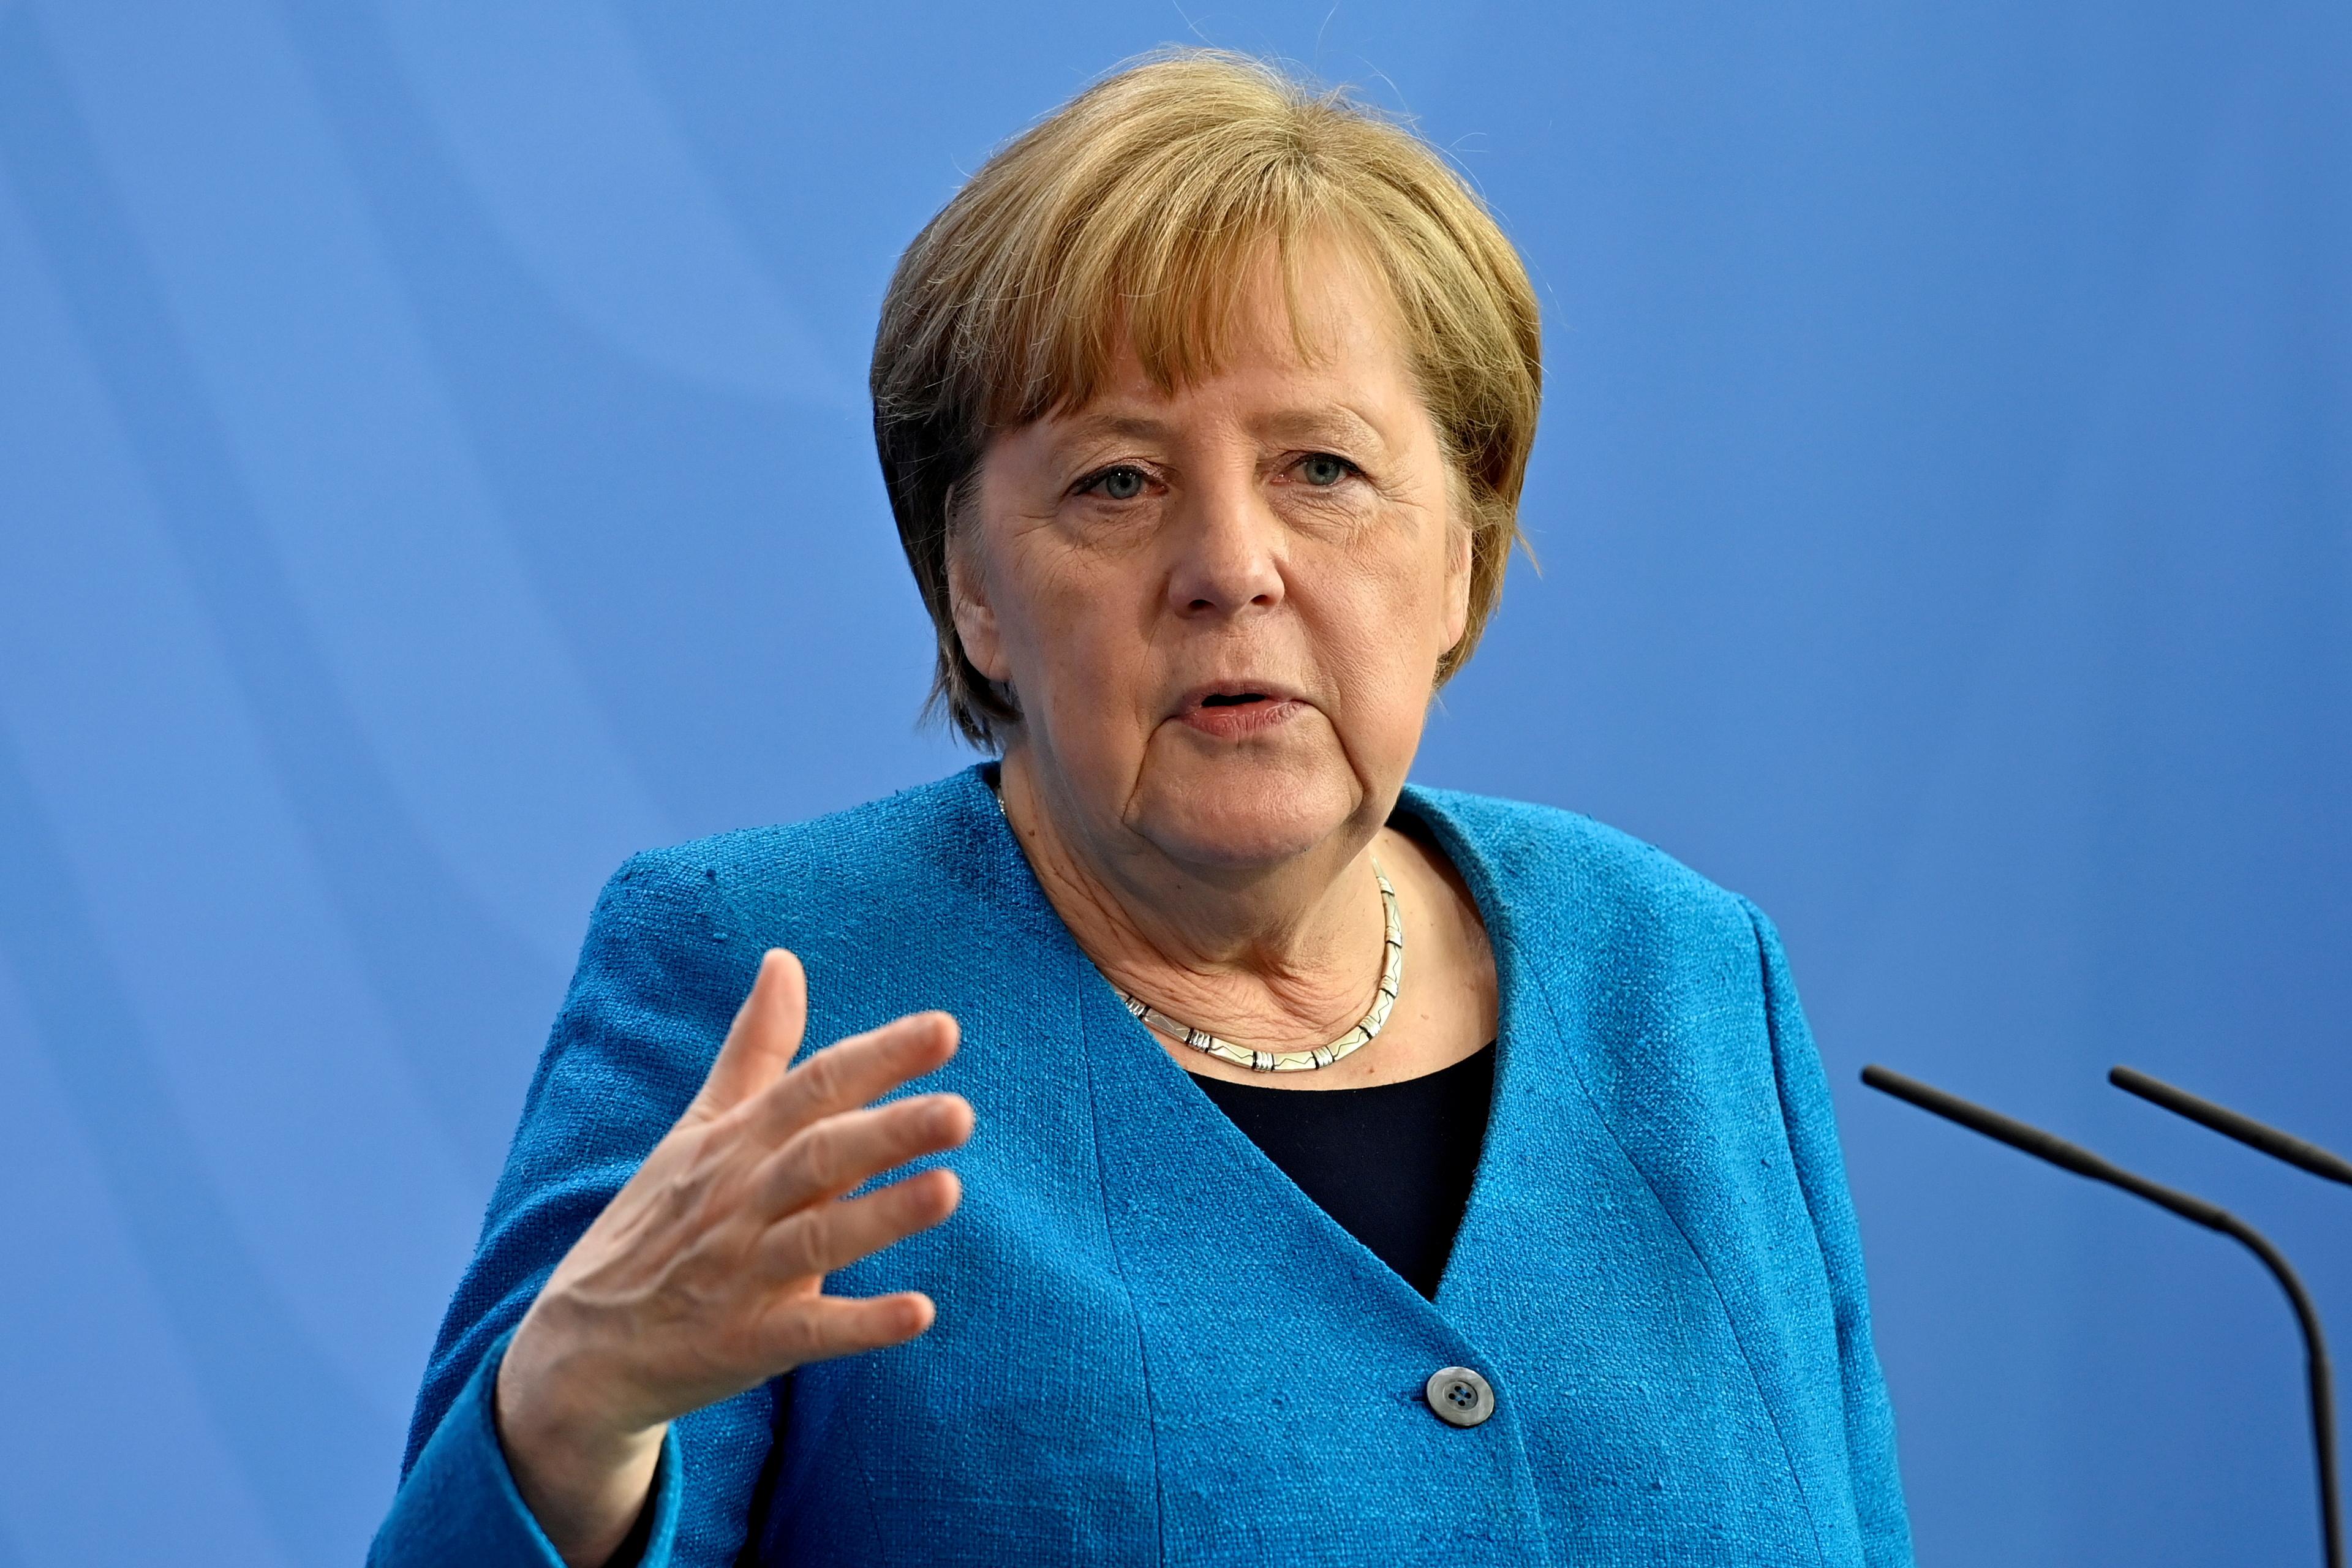 German Chancellor Angela Merkel in Berlin, Germany May 8, 2021. John MacDougall/Pool via REUTERS